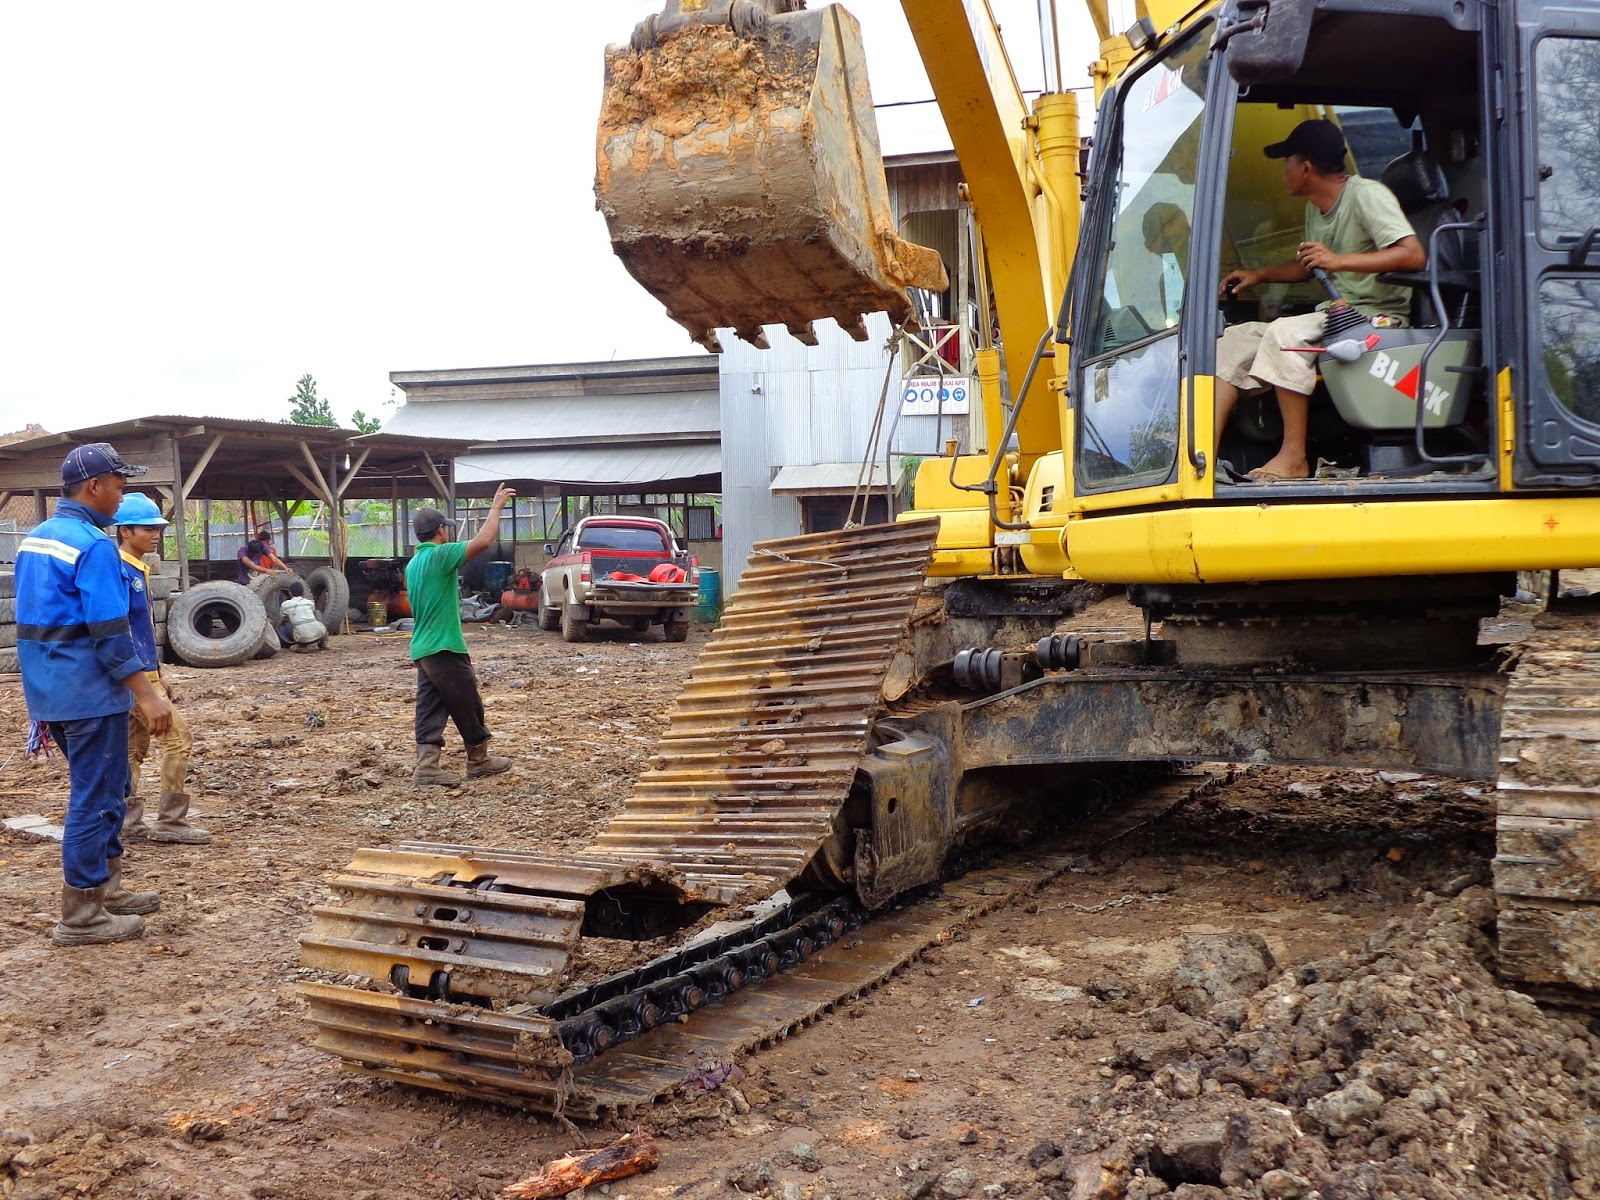 Operating Excavator safety regulations